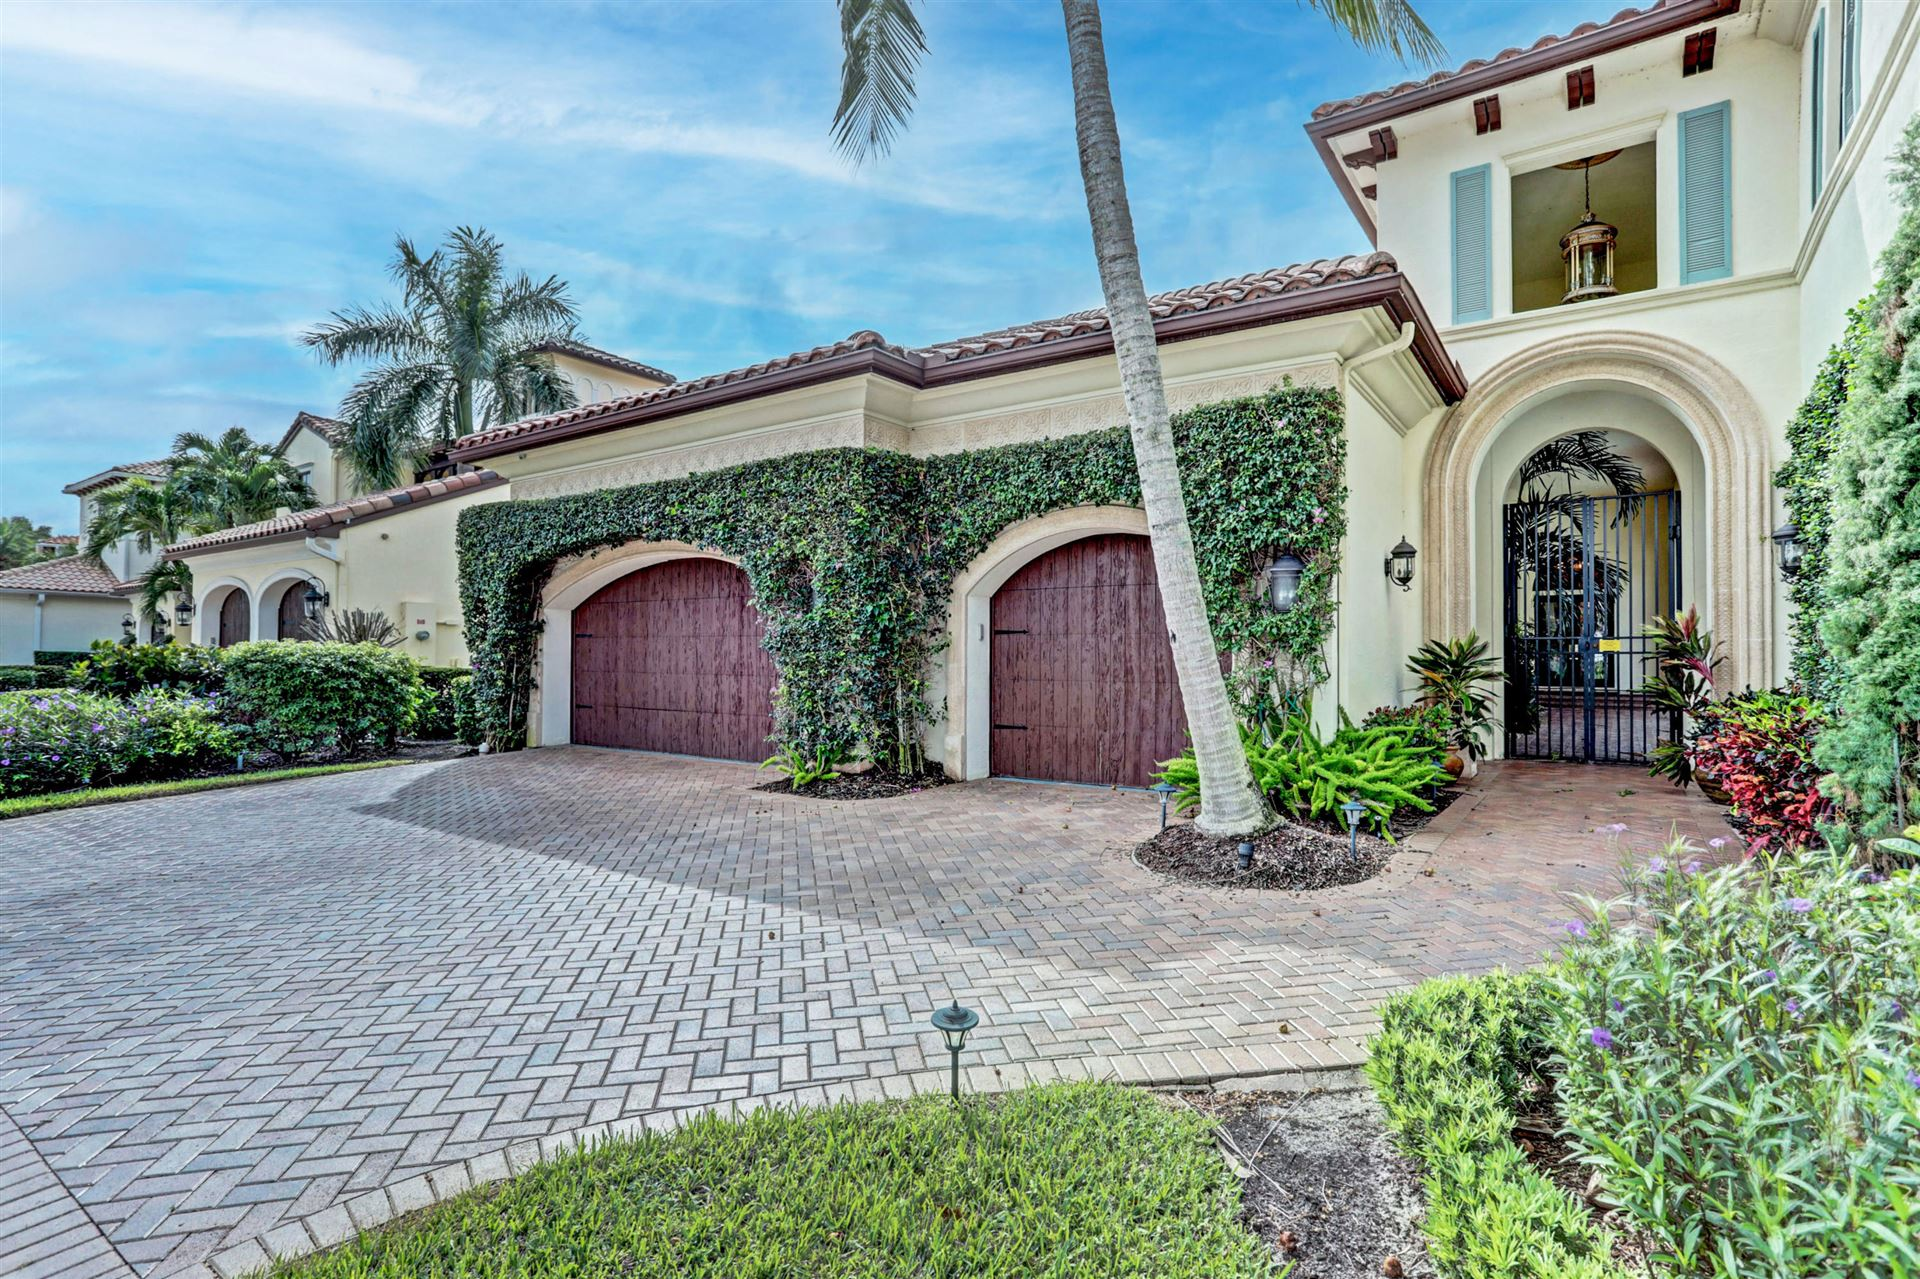 Photo of 119 Talavera Place, Palm Beach Gardens, FL 33418 (MLS # RX-10670612)